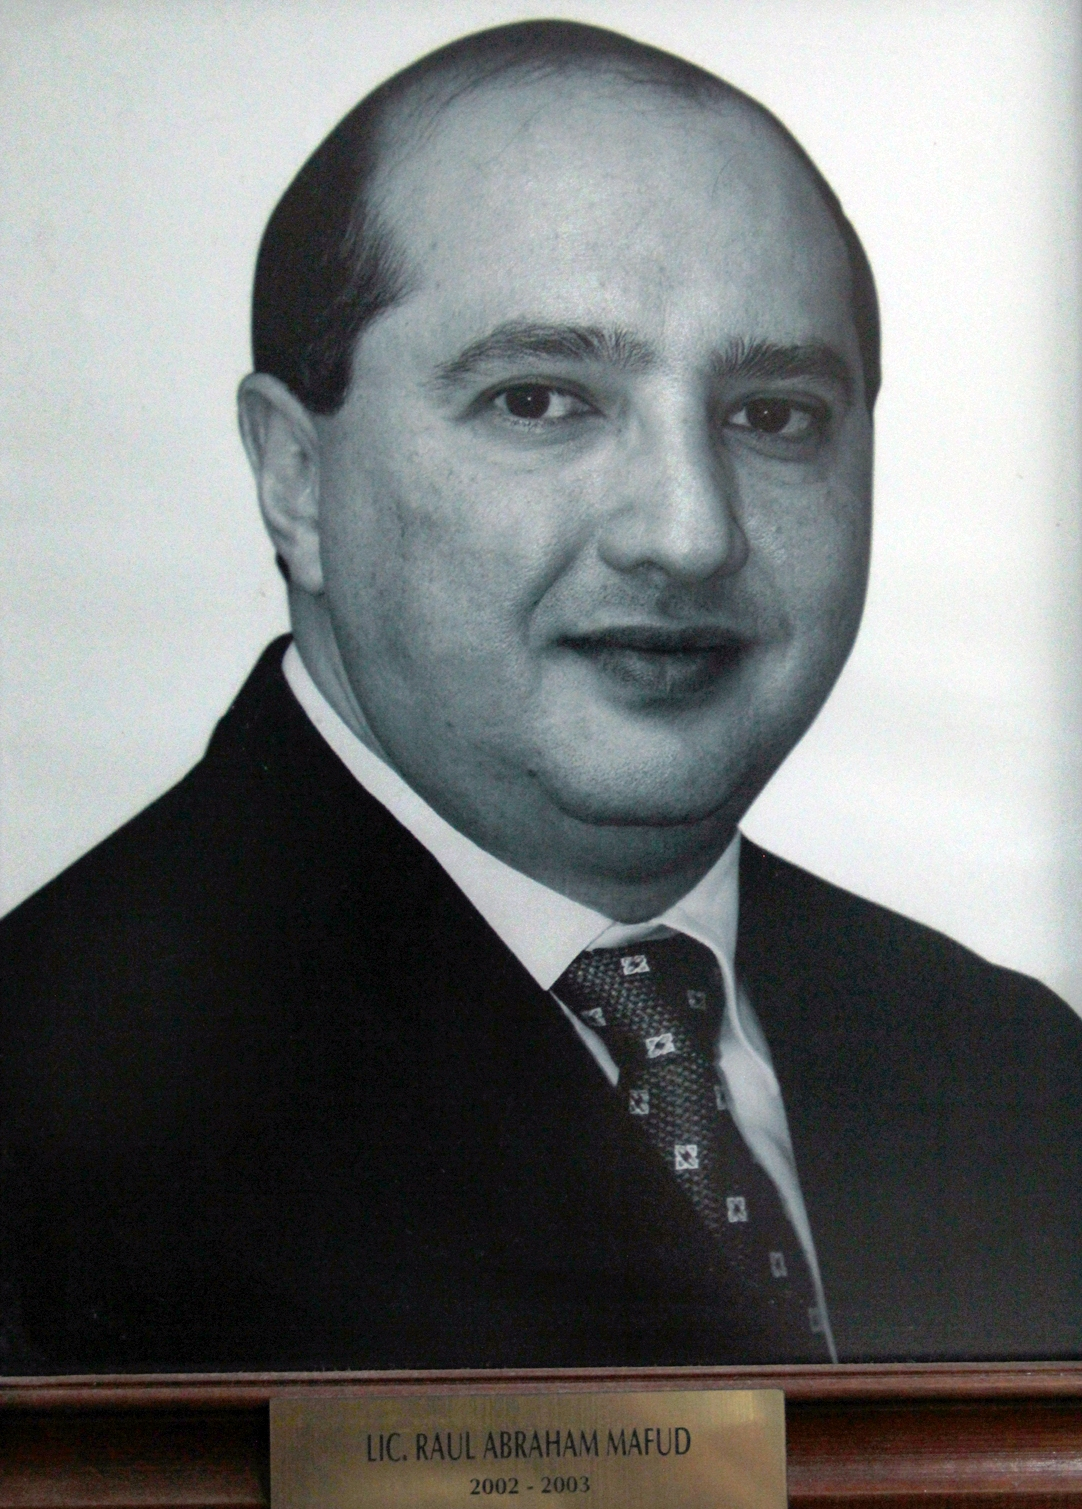 EMPRESARIO DISTINGUIDO LIC. RAUL ABRAHAM MAFUD